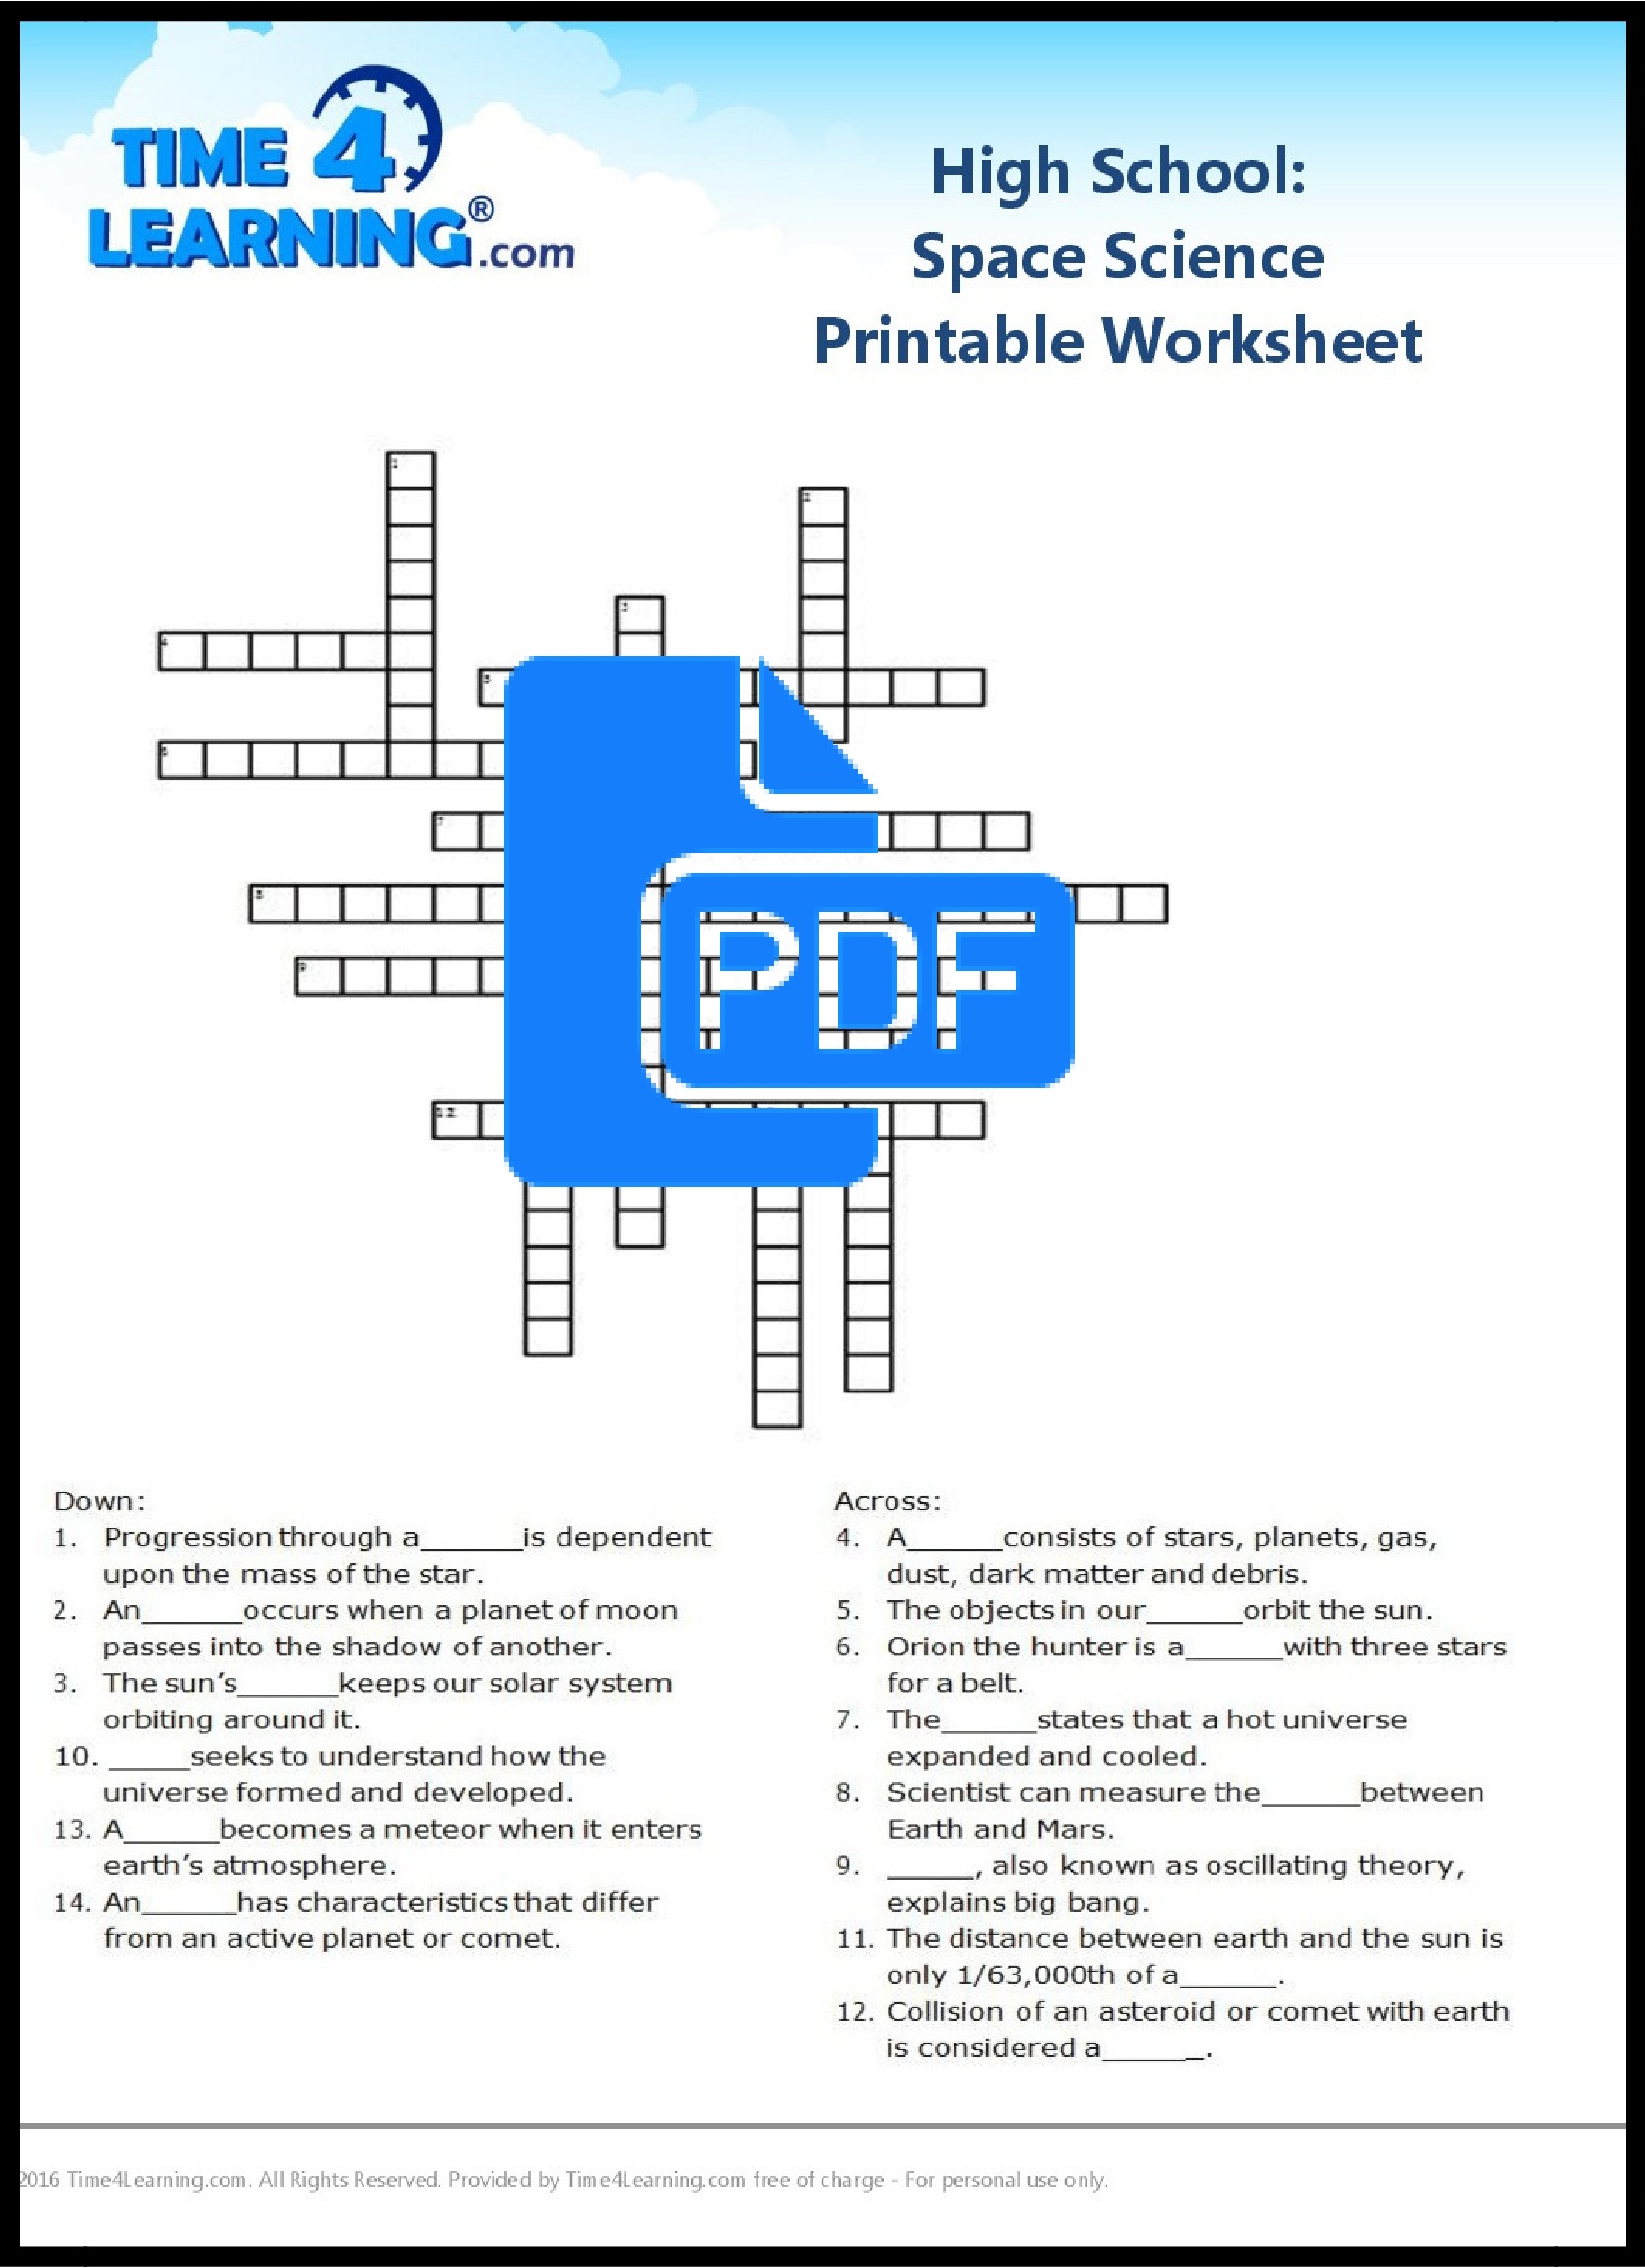 free worksheets simplifying complex numbers worksheet free math worksheets for kidergarten. Black Bedroom Furniture Sets. Home Design Ideas